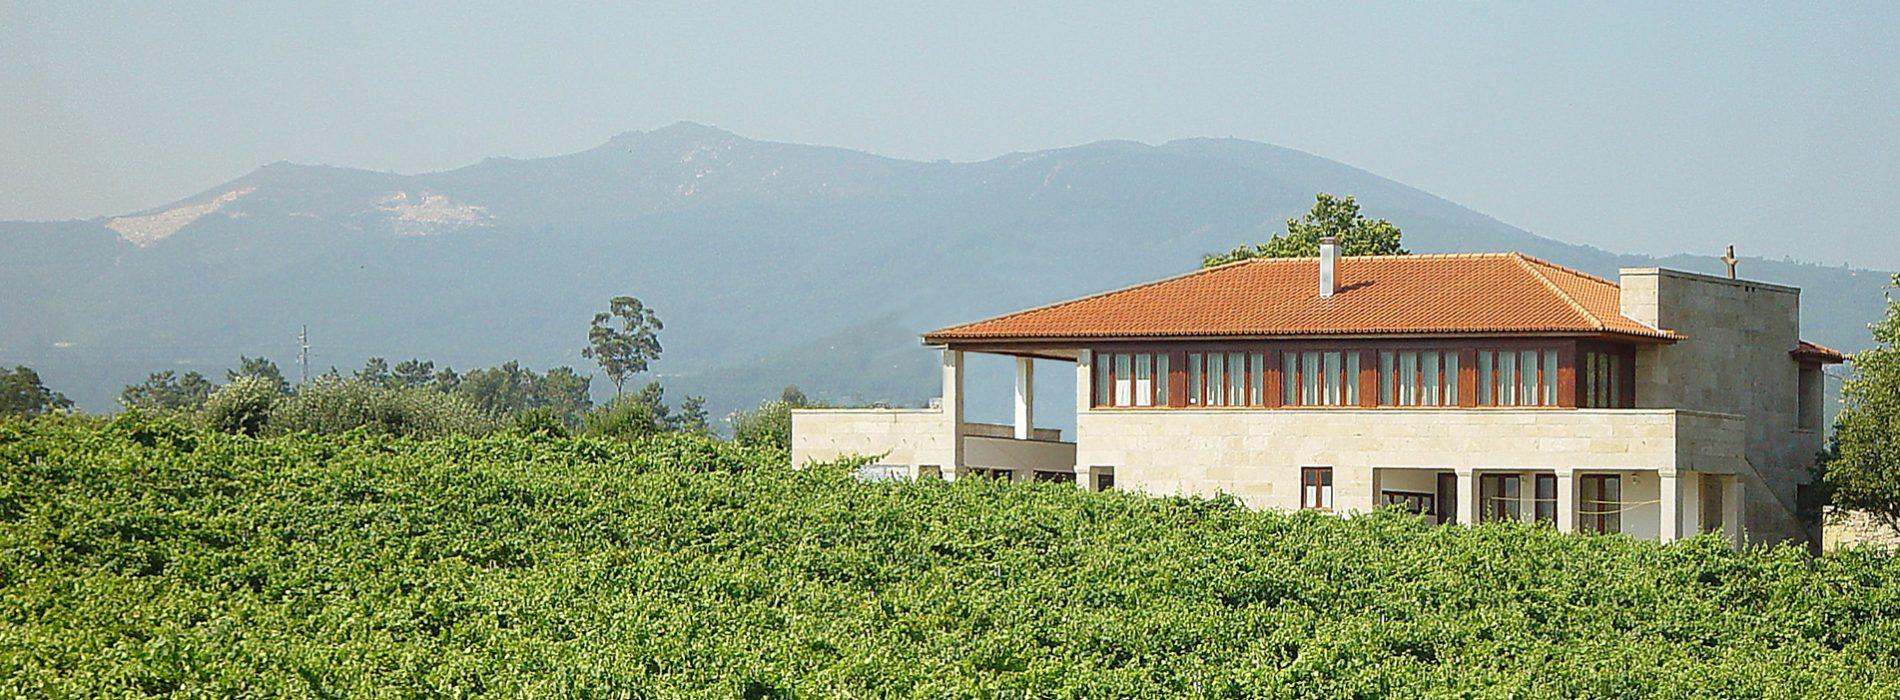 Casa-em-Santo-Amaro-fachada-latera-montanhal